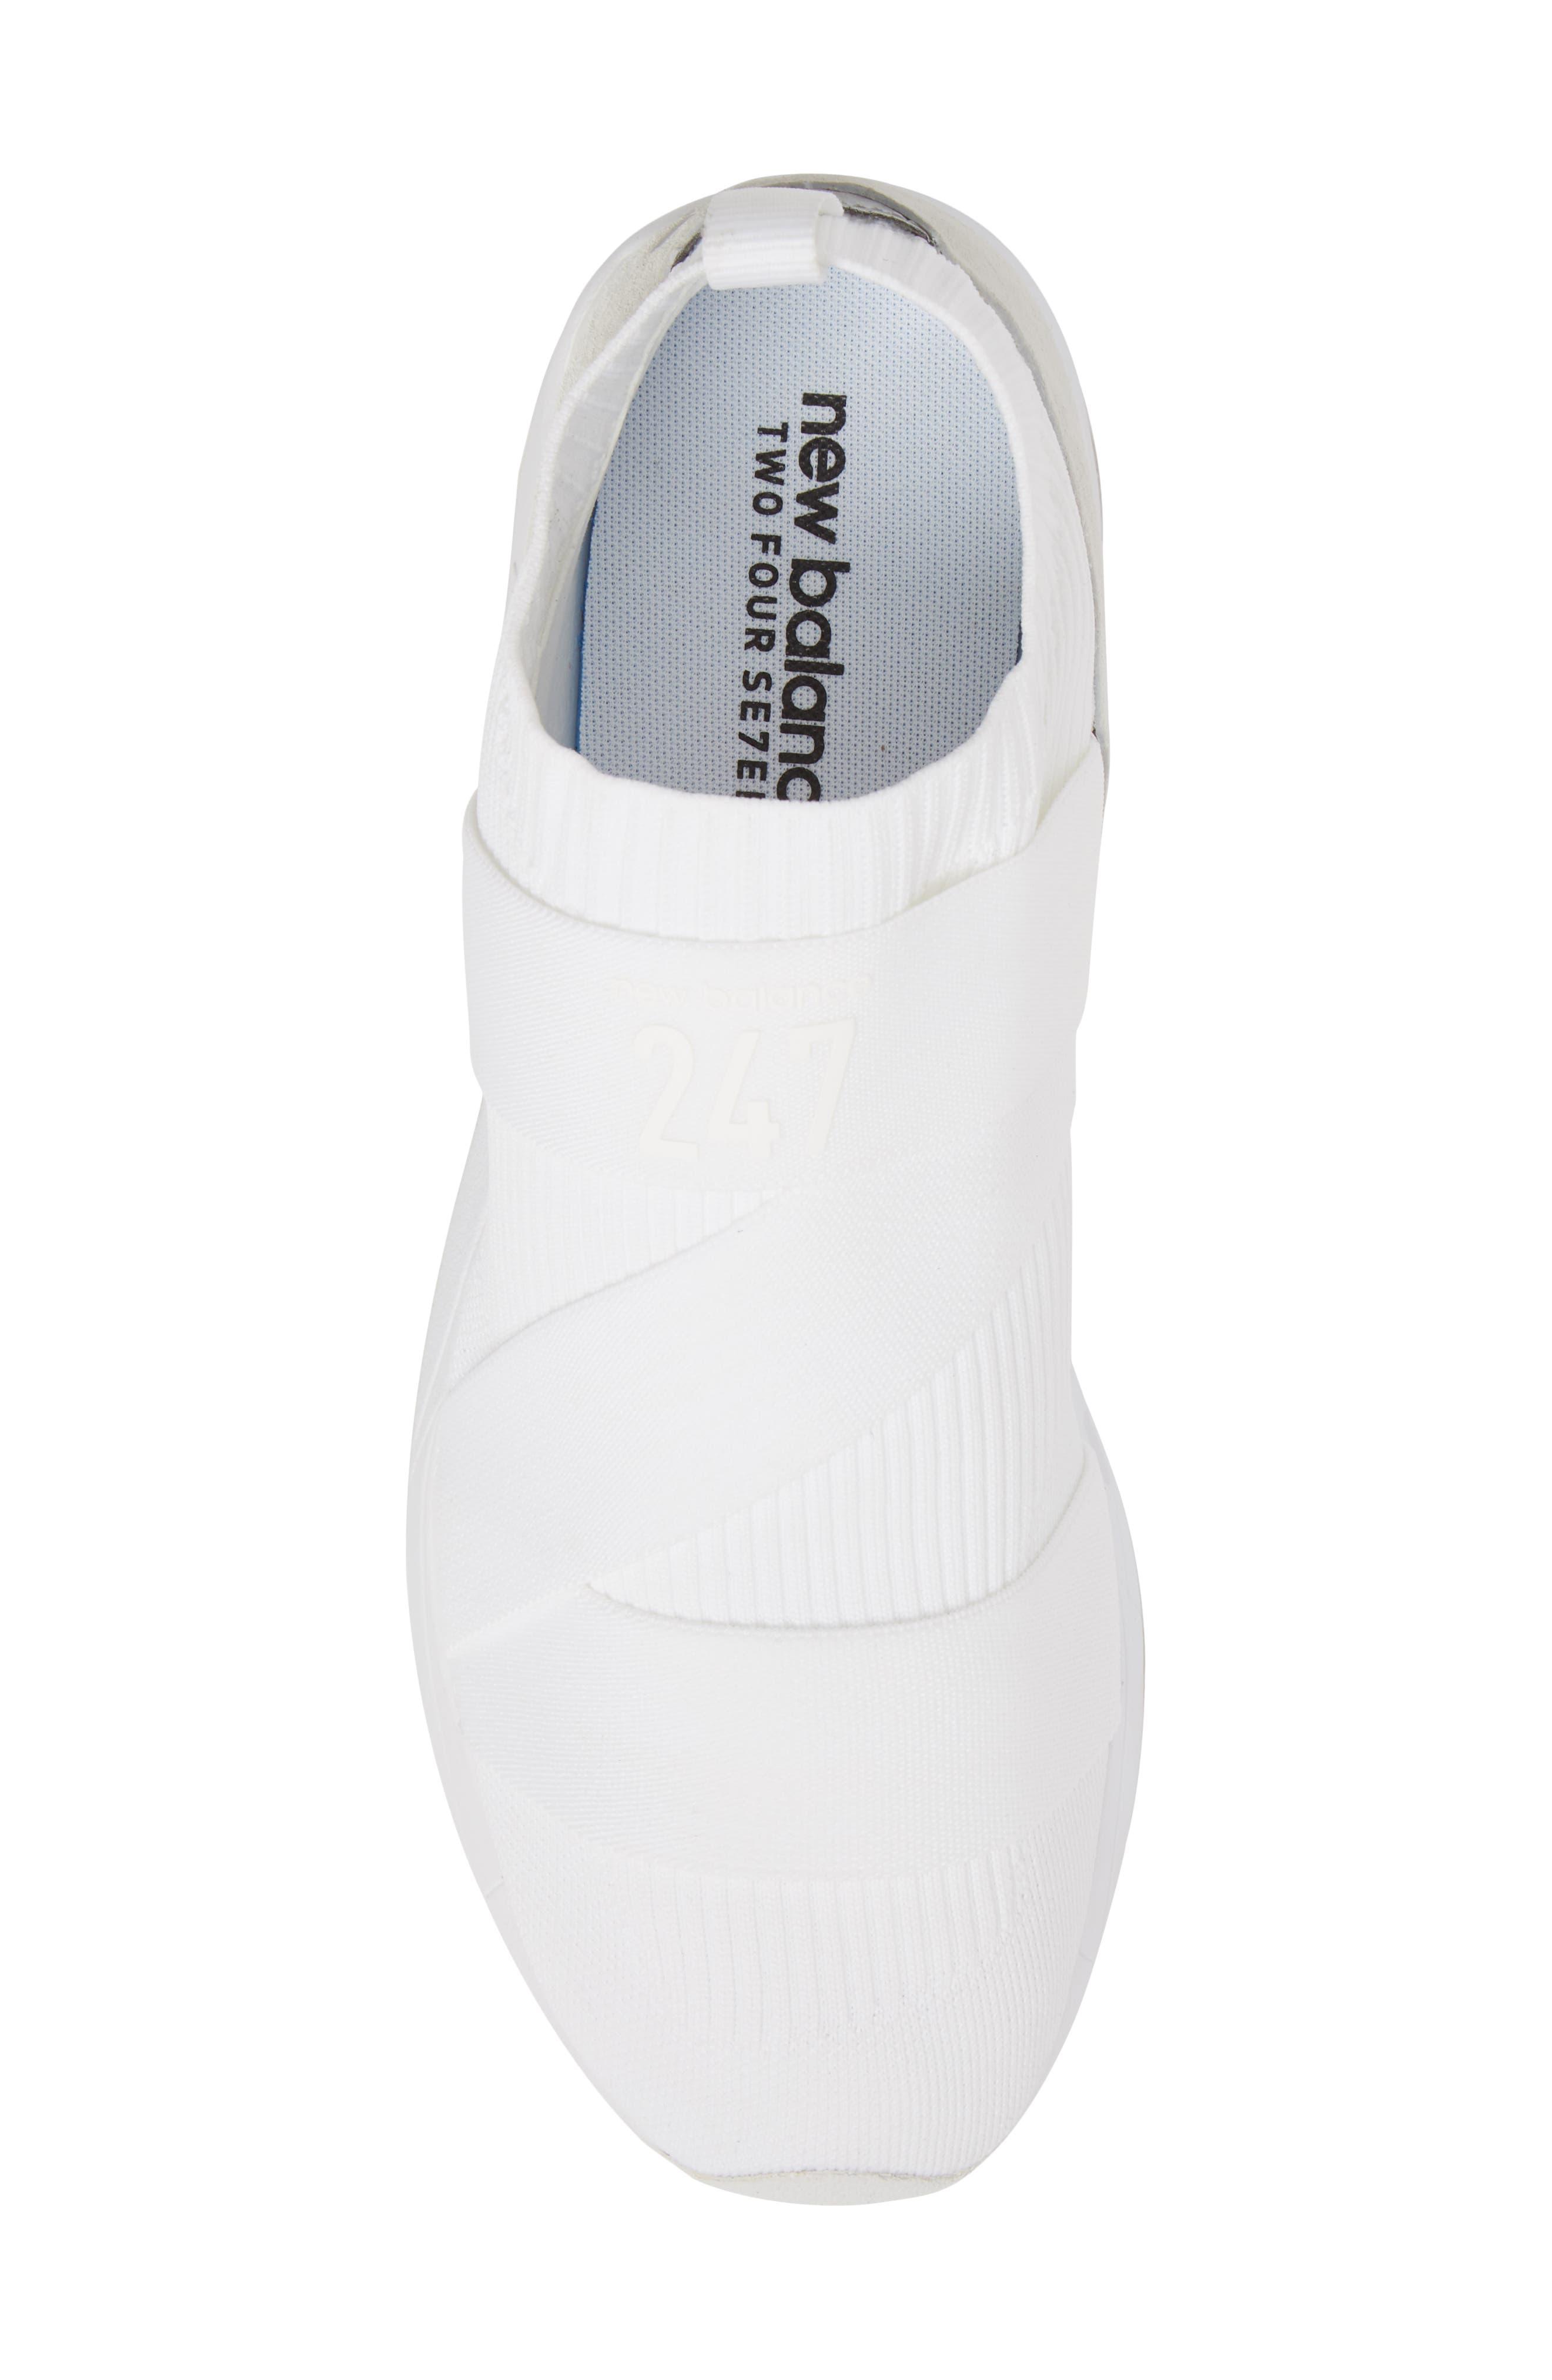 247 Knit Sneaker,                             Alternate thumbnail 5, color,                             WHITE